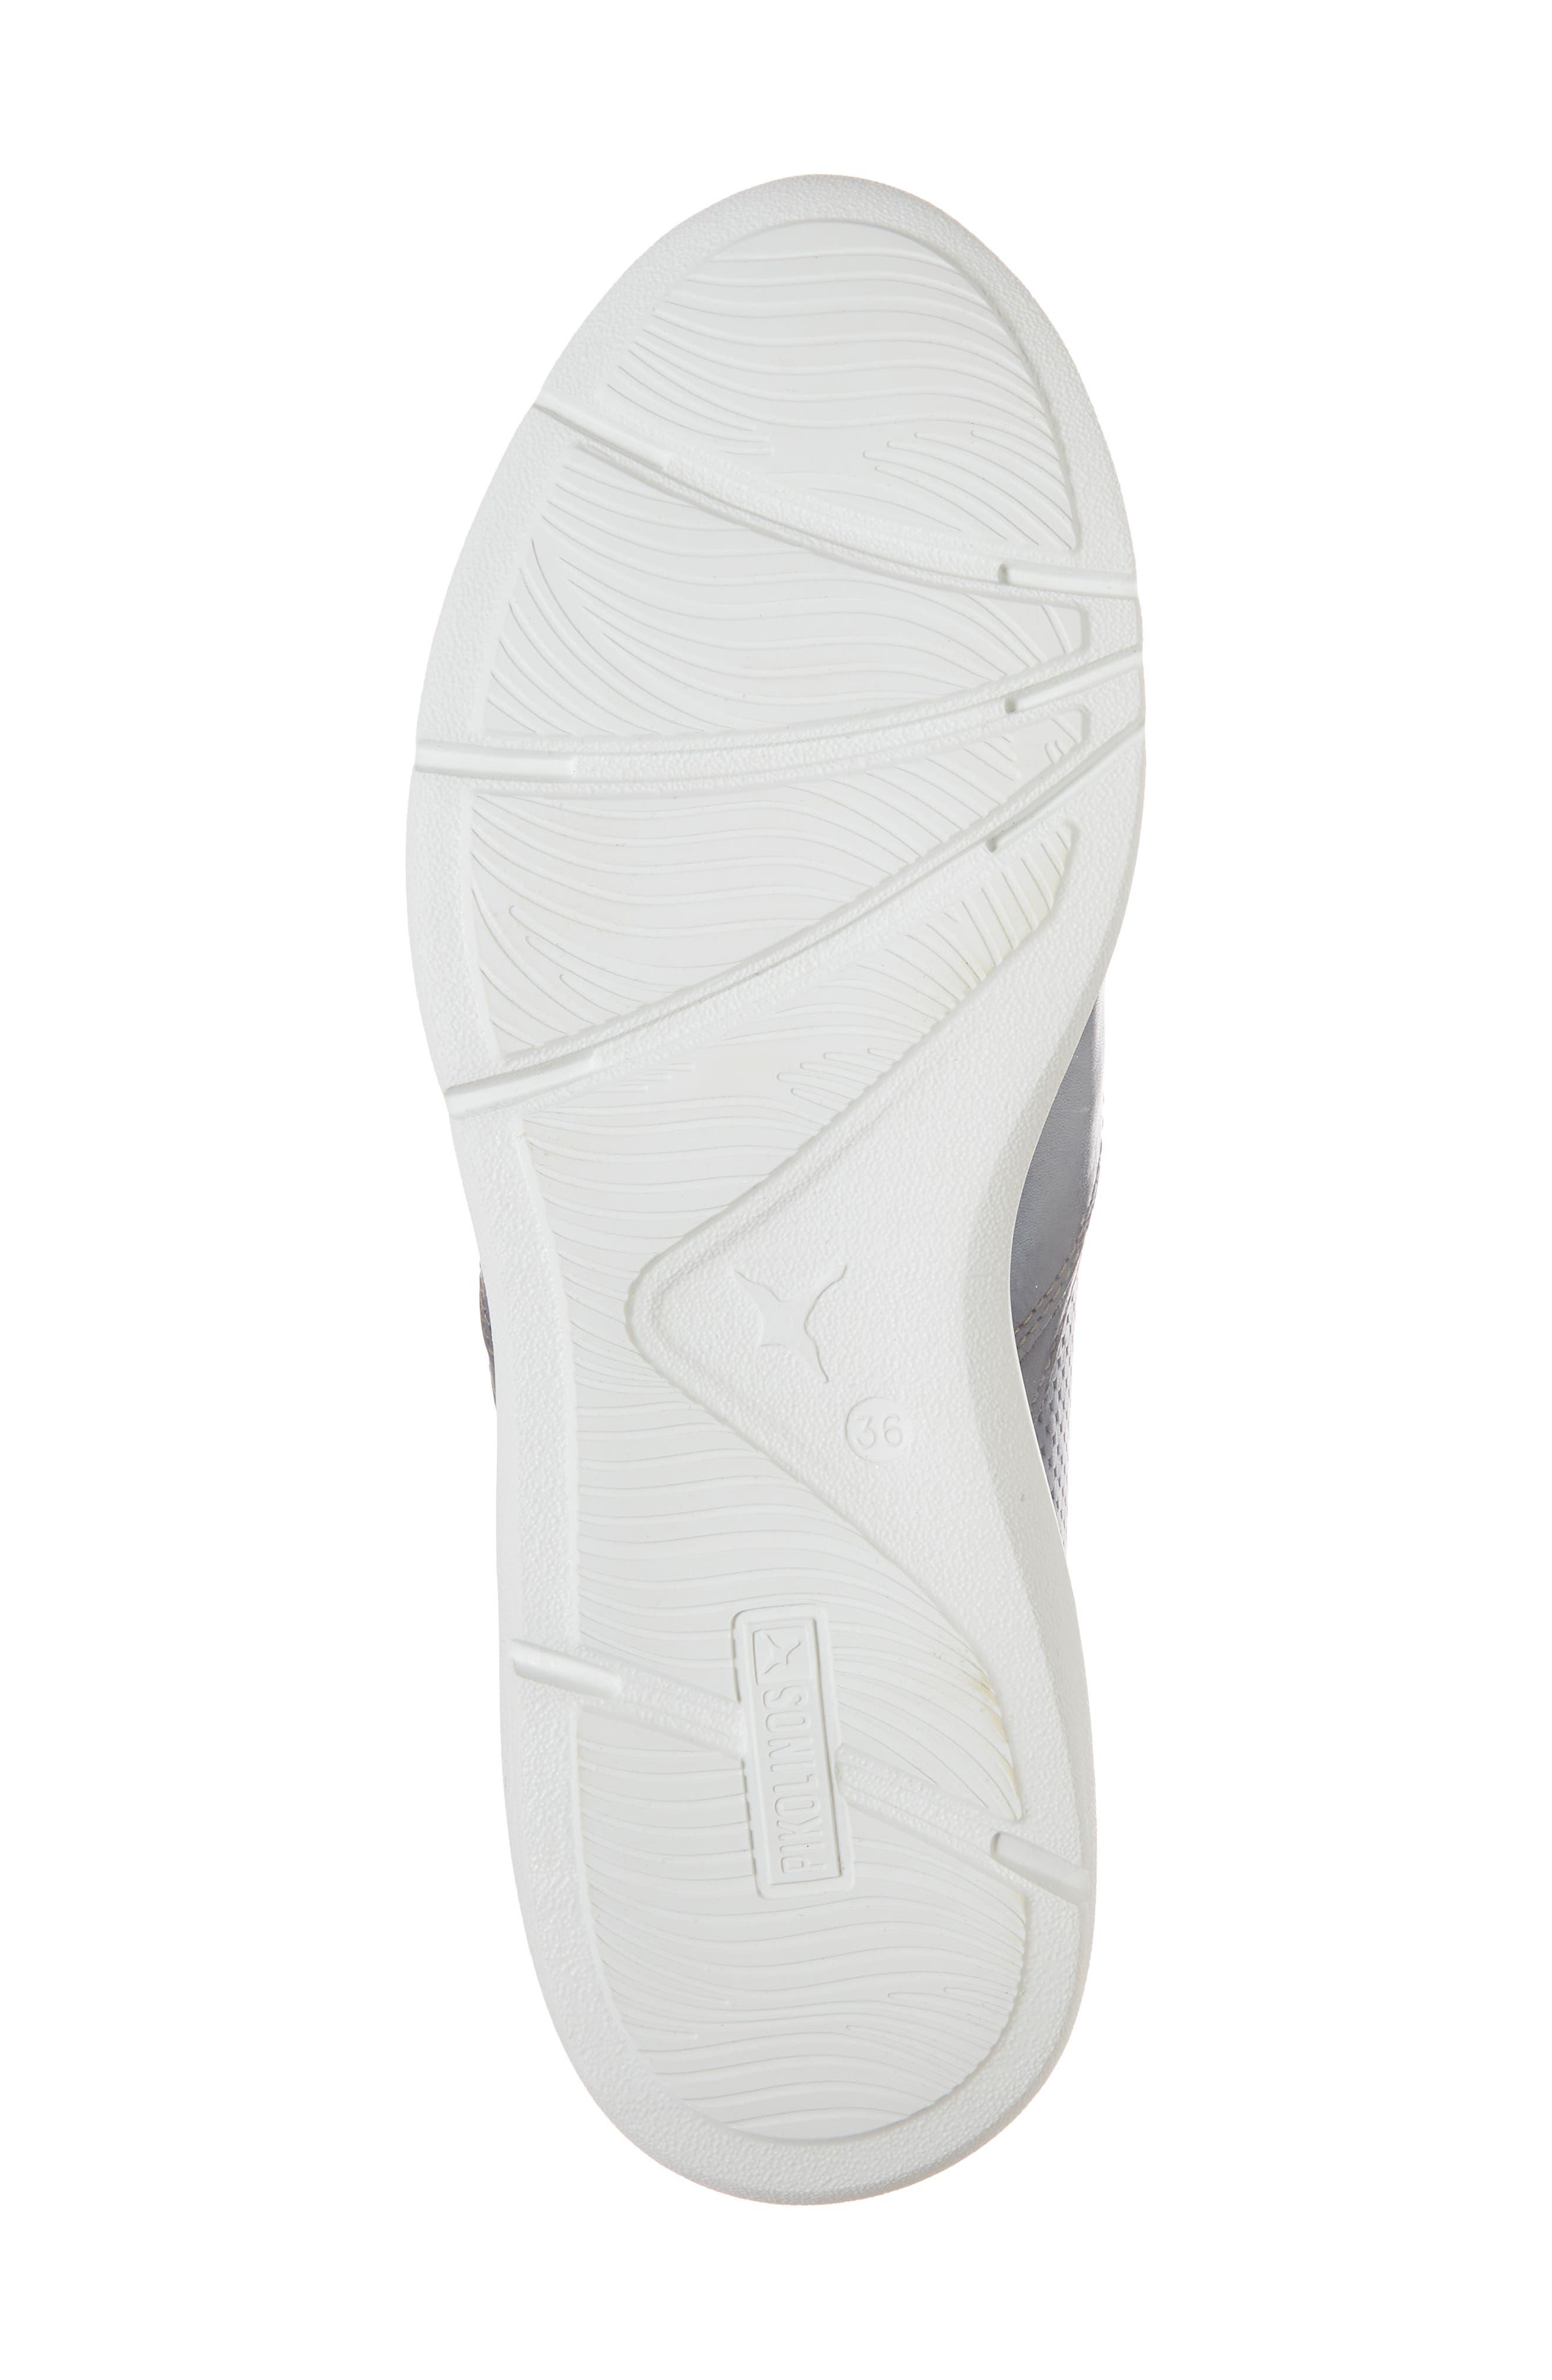 Modena Sneaker,                             Alternate thumbnail 6, color,                             400